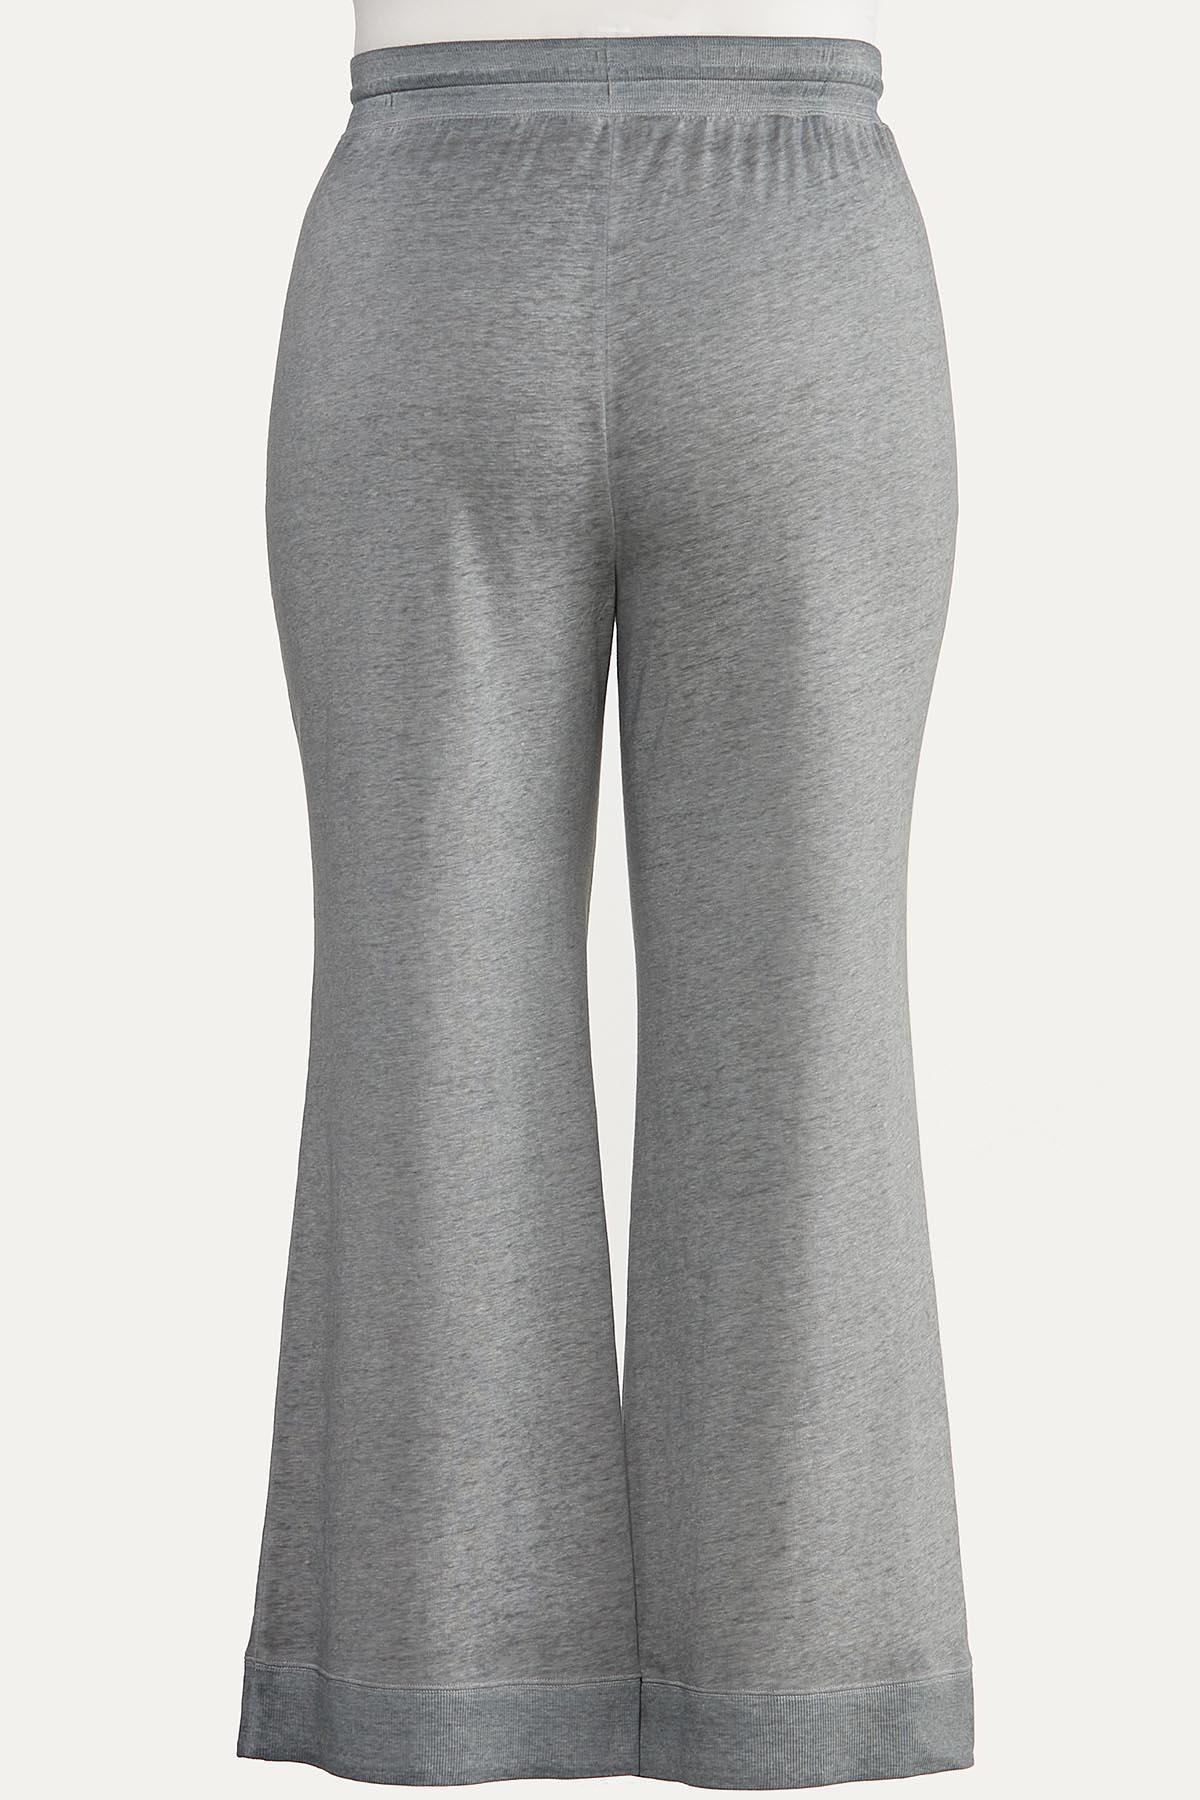 Plus Size Gray Flare Lounge Pants (Item #44615487)